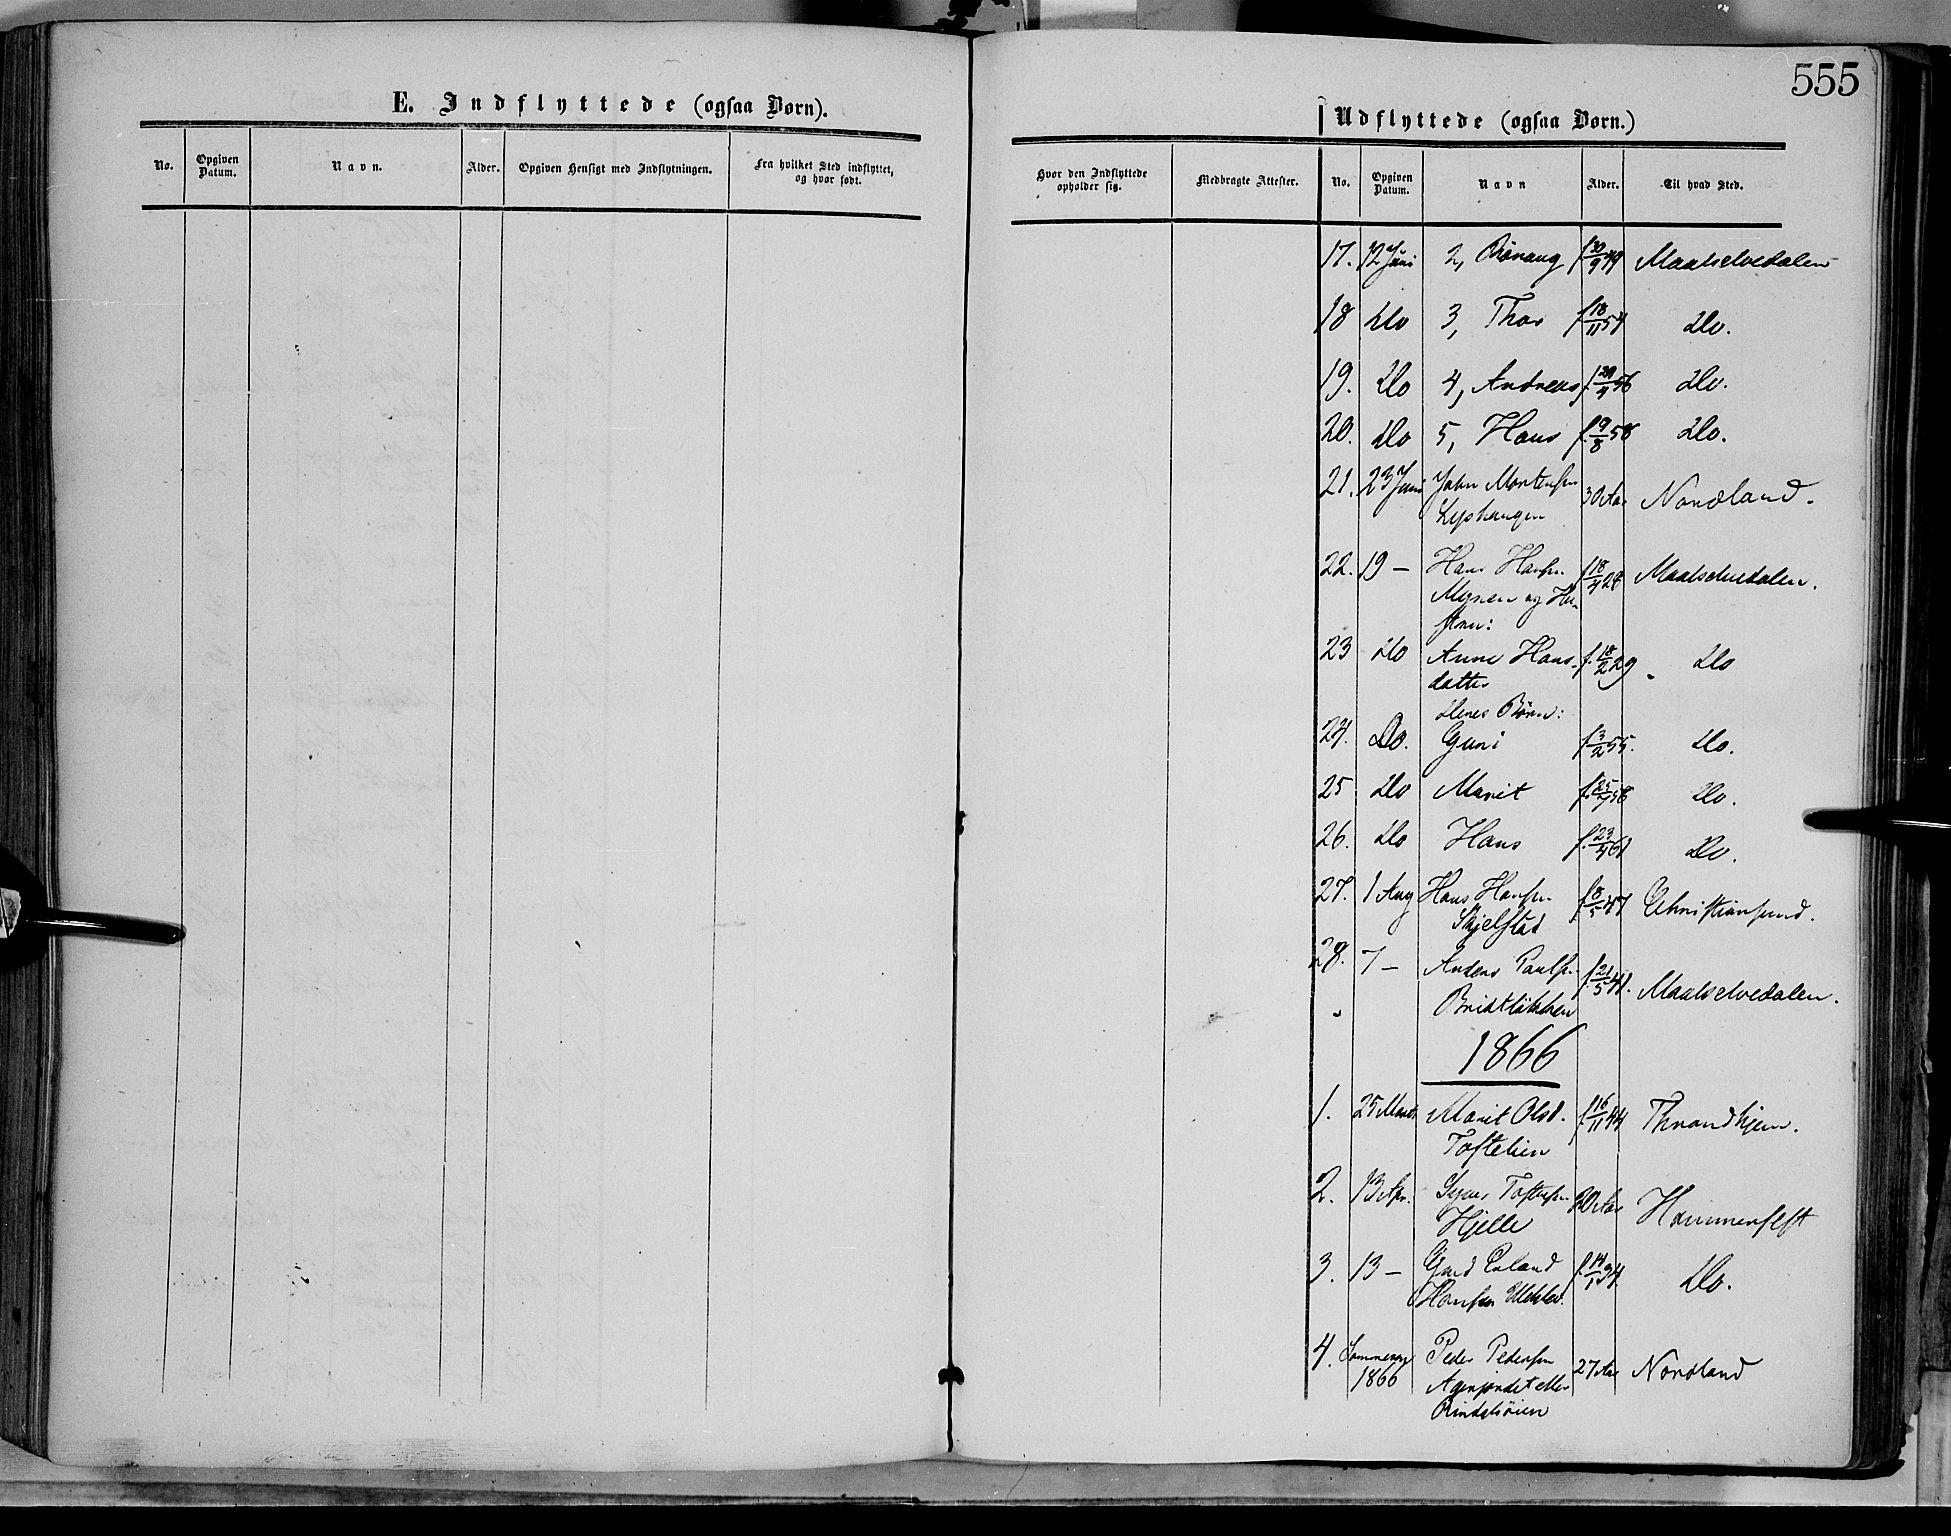 SAH, Dovre prestekontor, Ministerialbok nr. 1, 1854-1878, s. 555